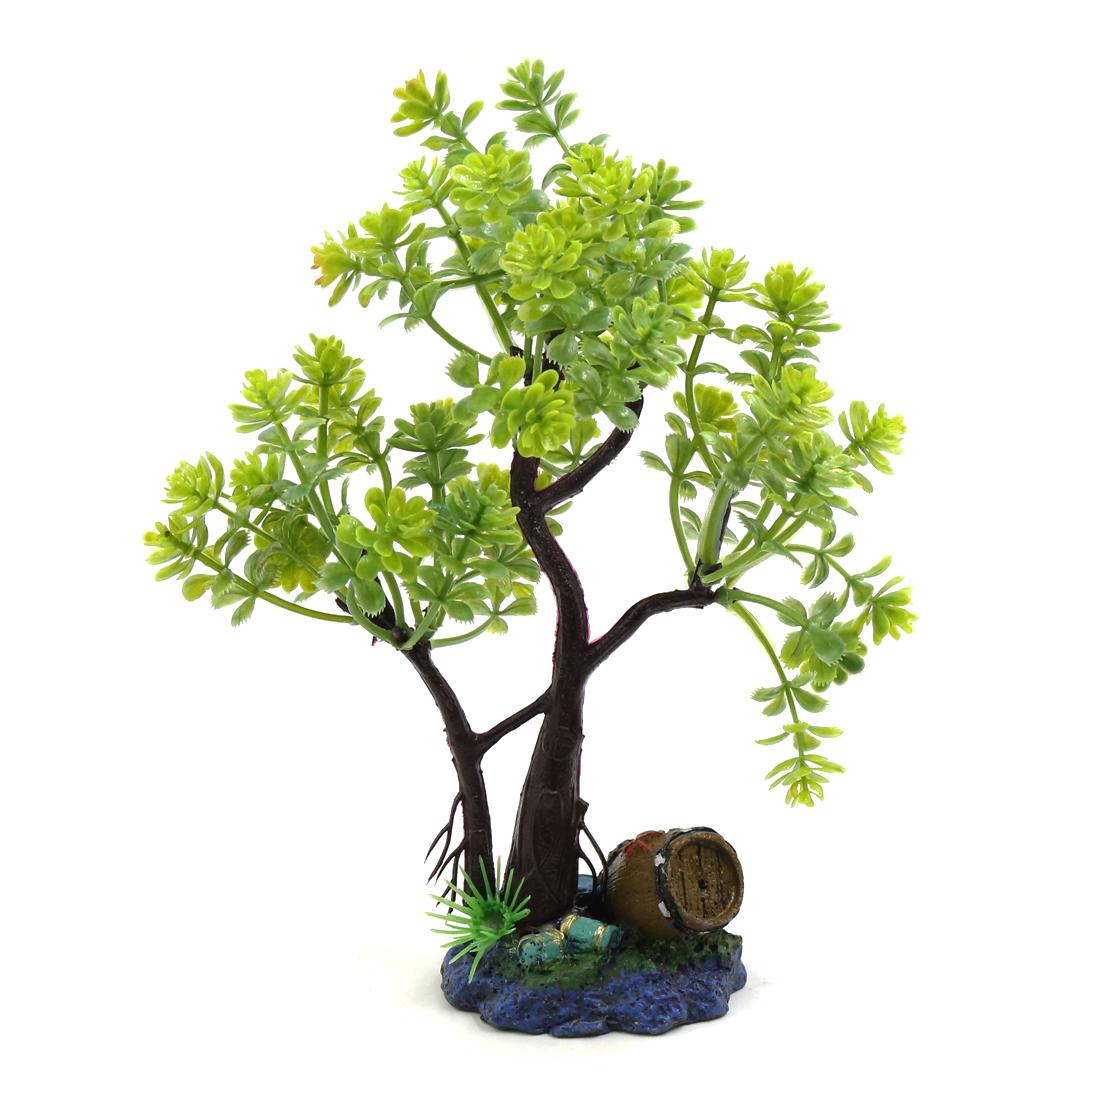 Green Plastic Tree Fishbowl Aquarium Decorative Plant Waterscape Decor w/ Stand - image 3 de 3